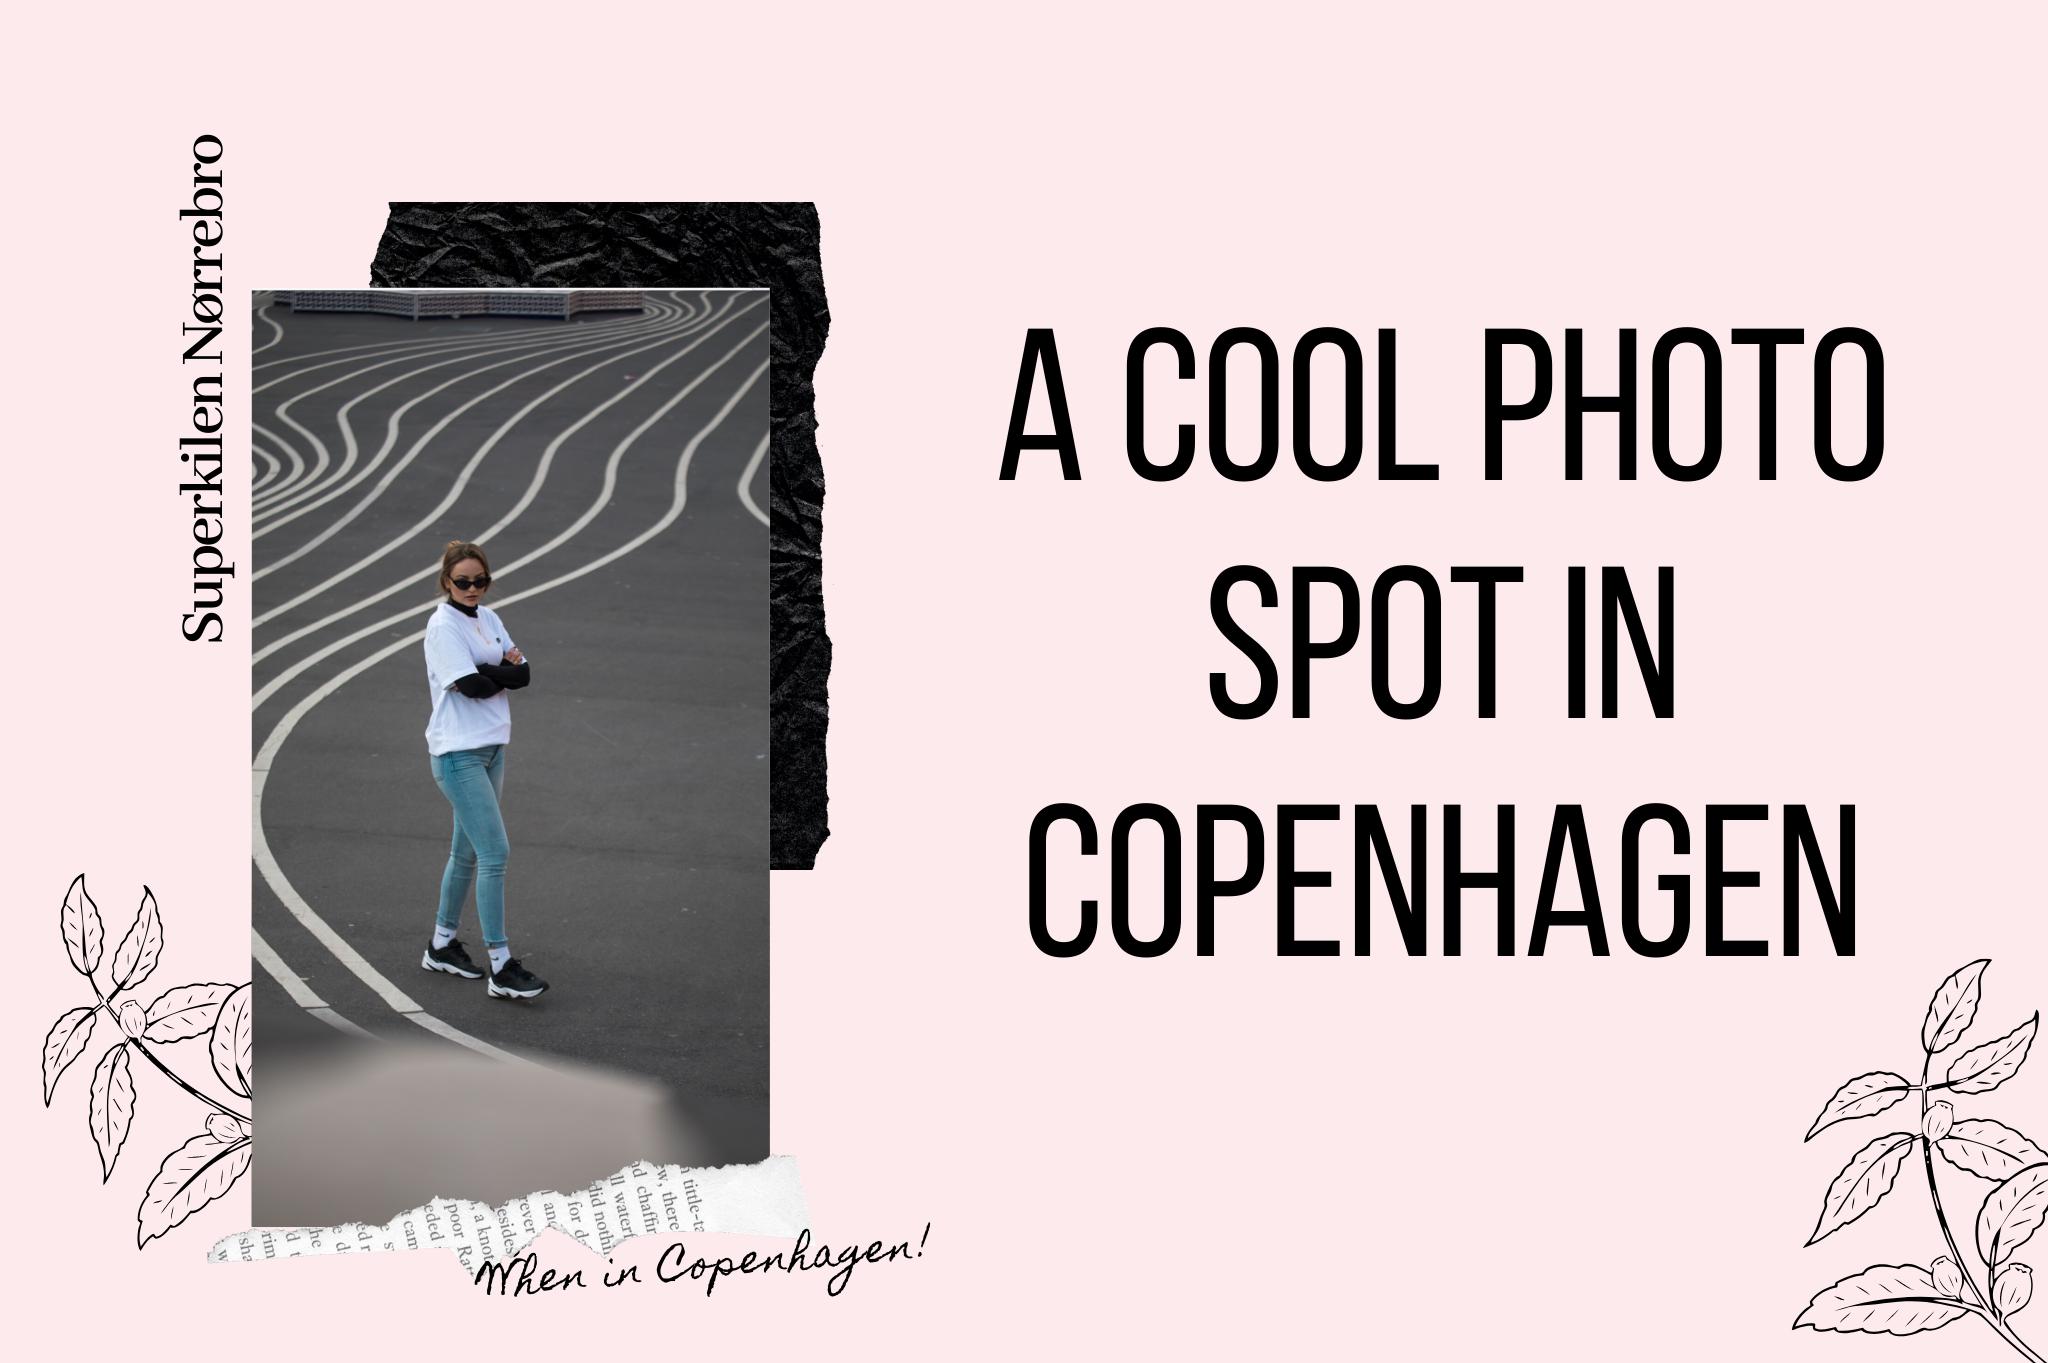 Superkilen Copenhagen place with stripes cool photo spot in Copenhagen